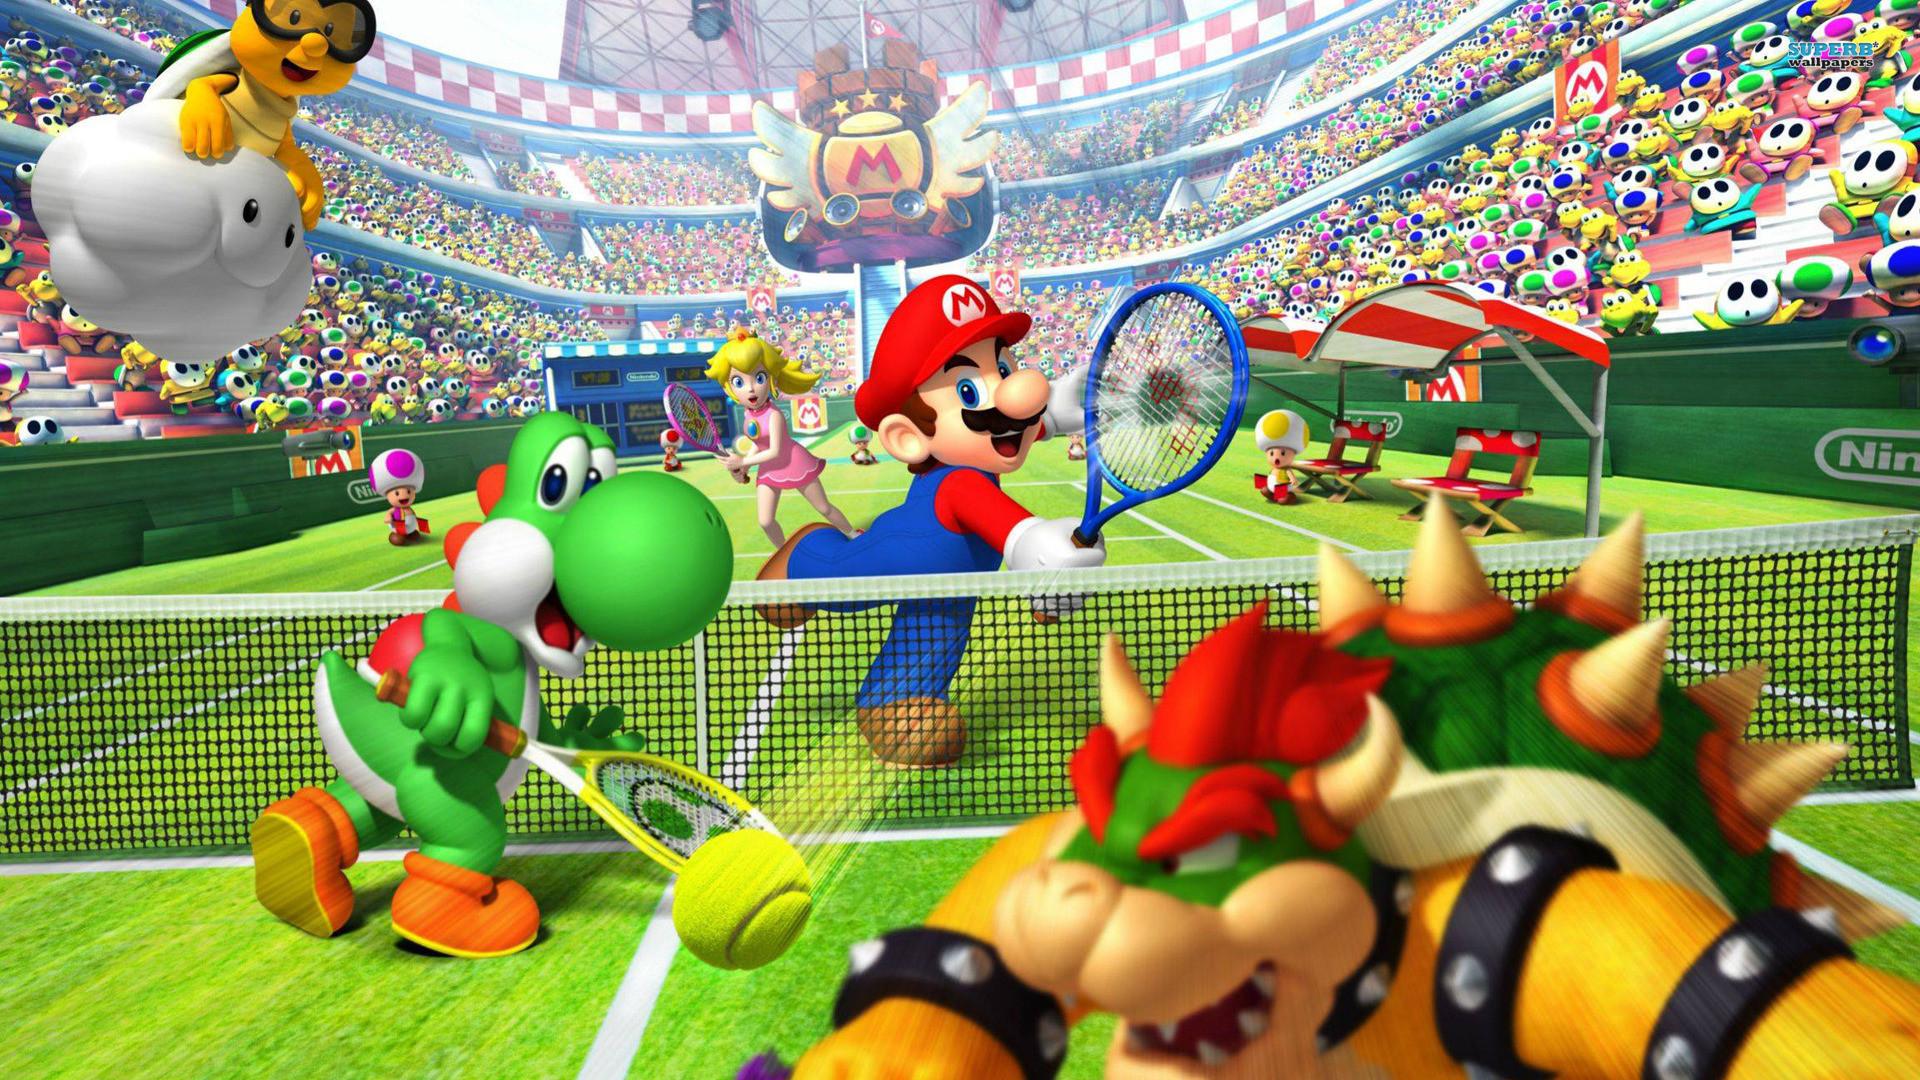 Mario Hd Wallpaper 74 Images